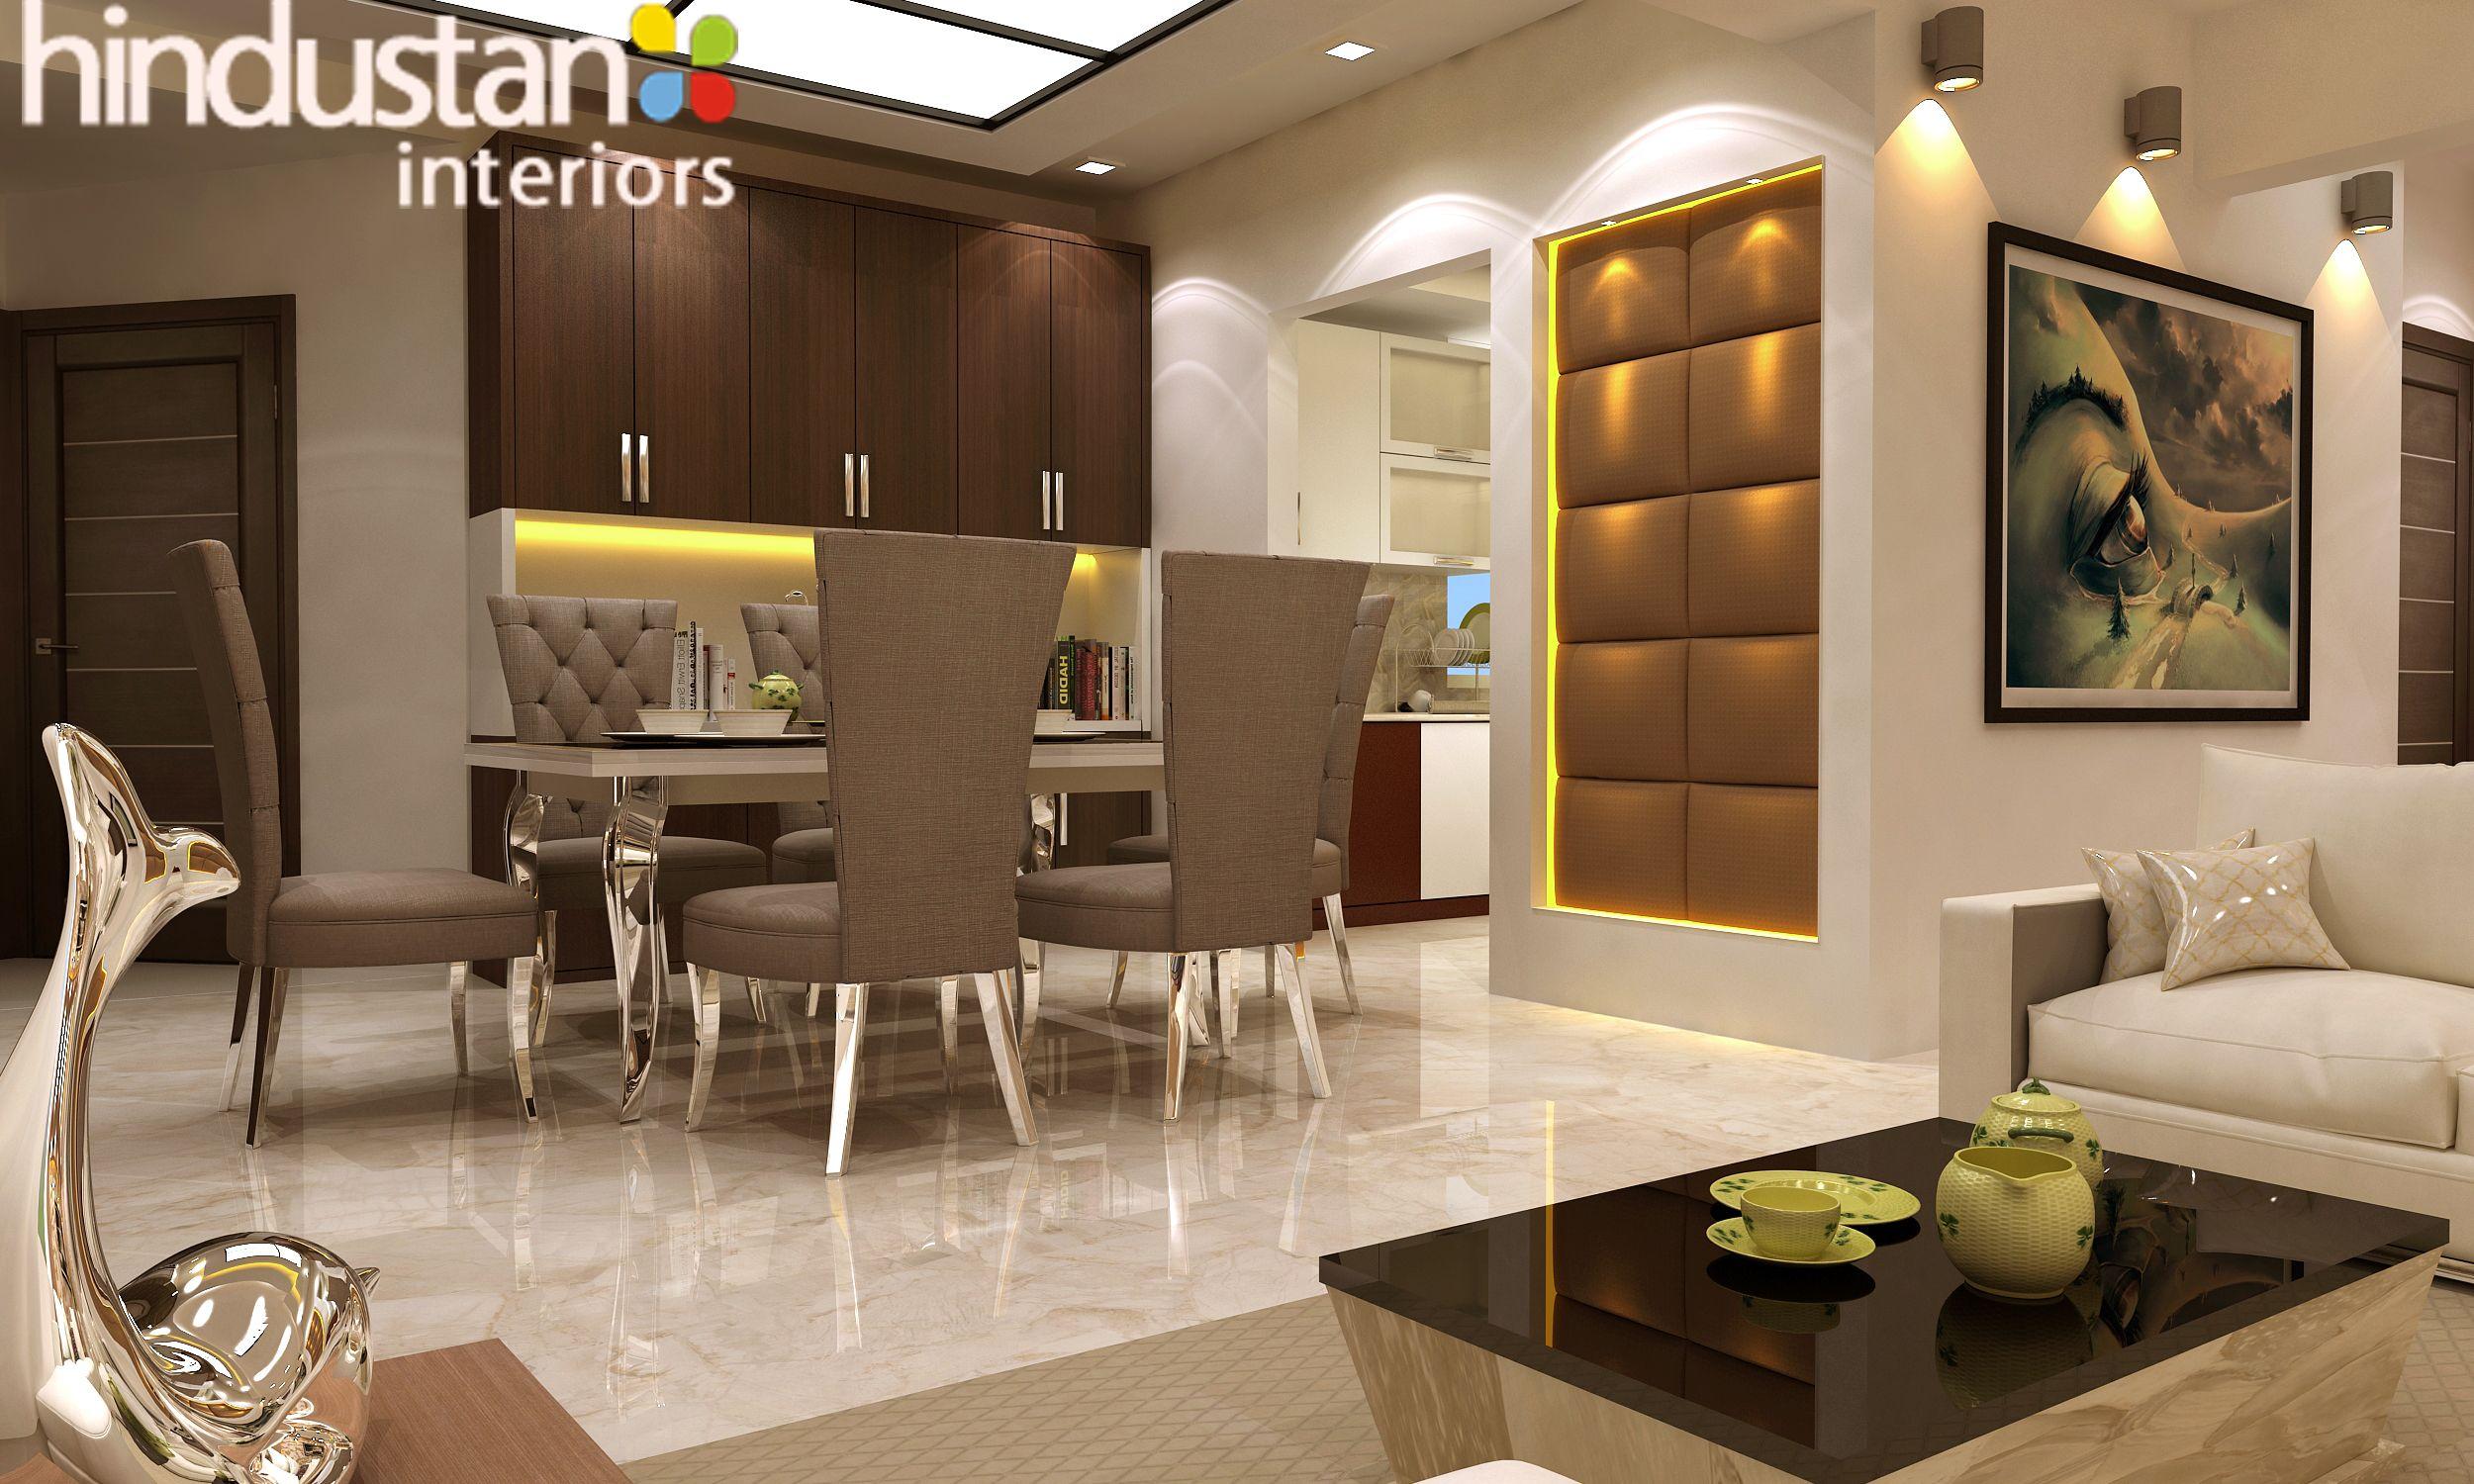 Hindustan Interiors Offers Residential Interior Designing Services